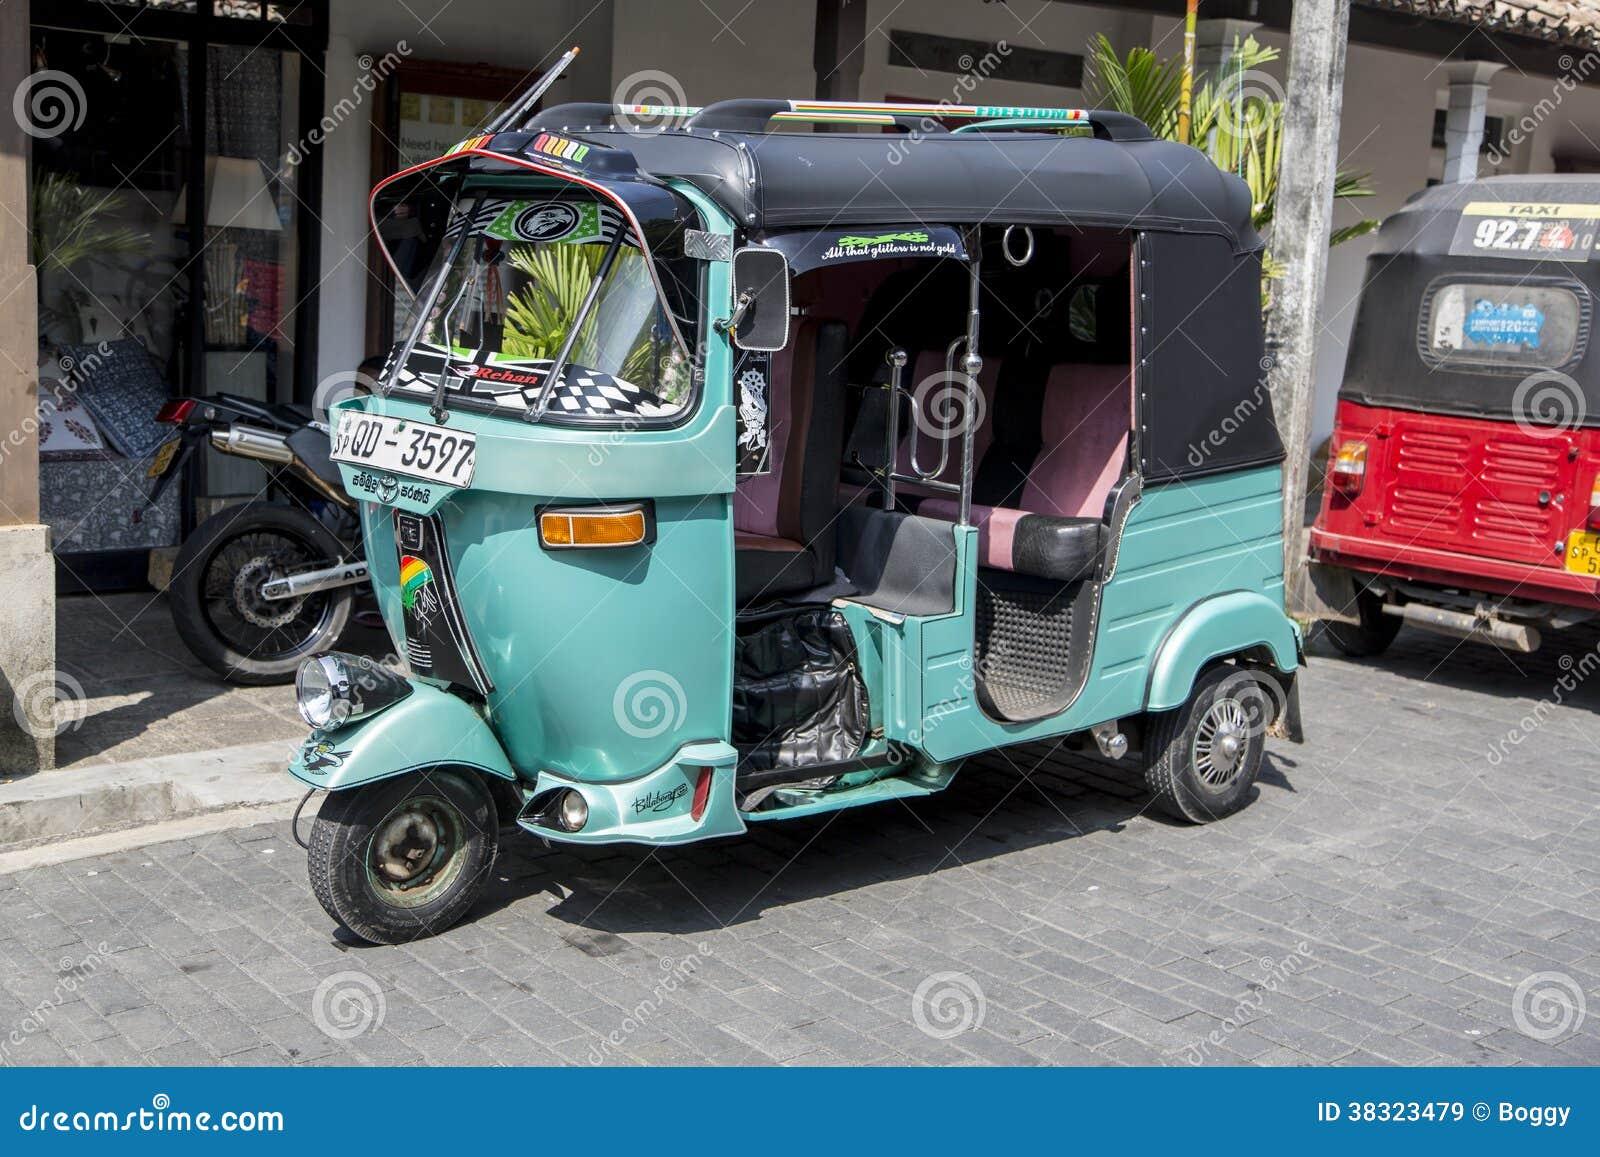 Auto rickshaw editorial stock image. Image of street - 38323479